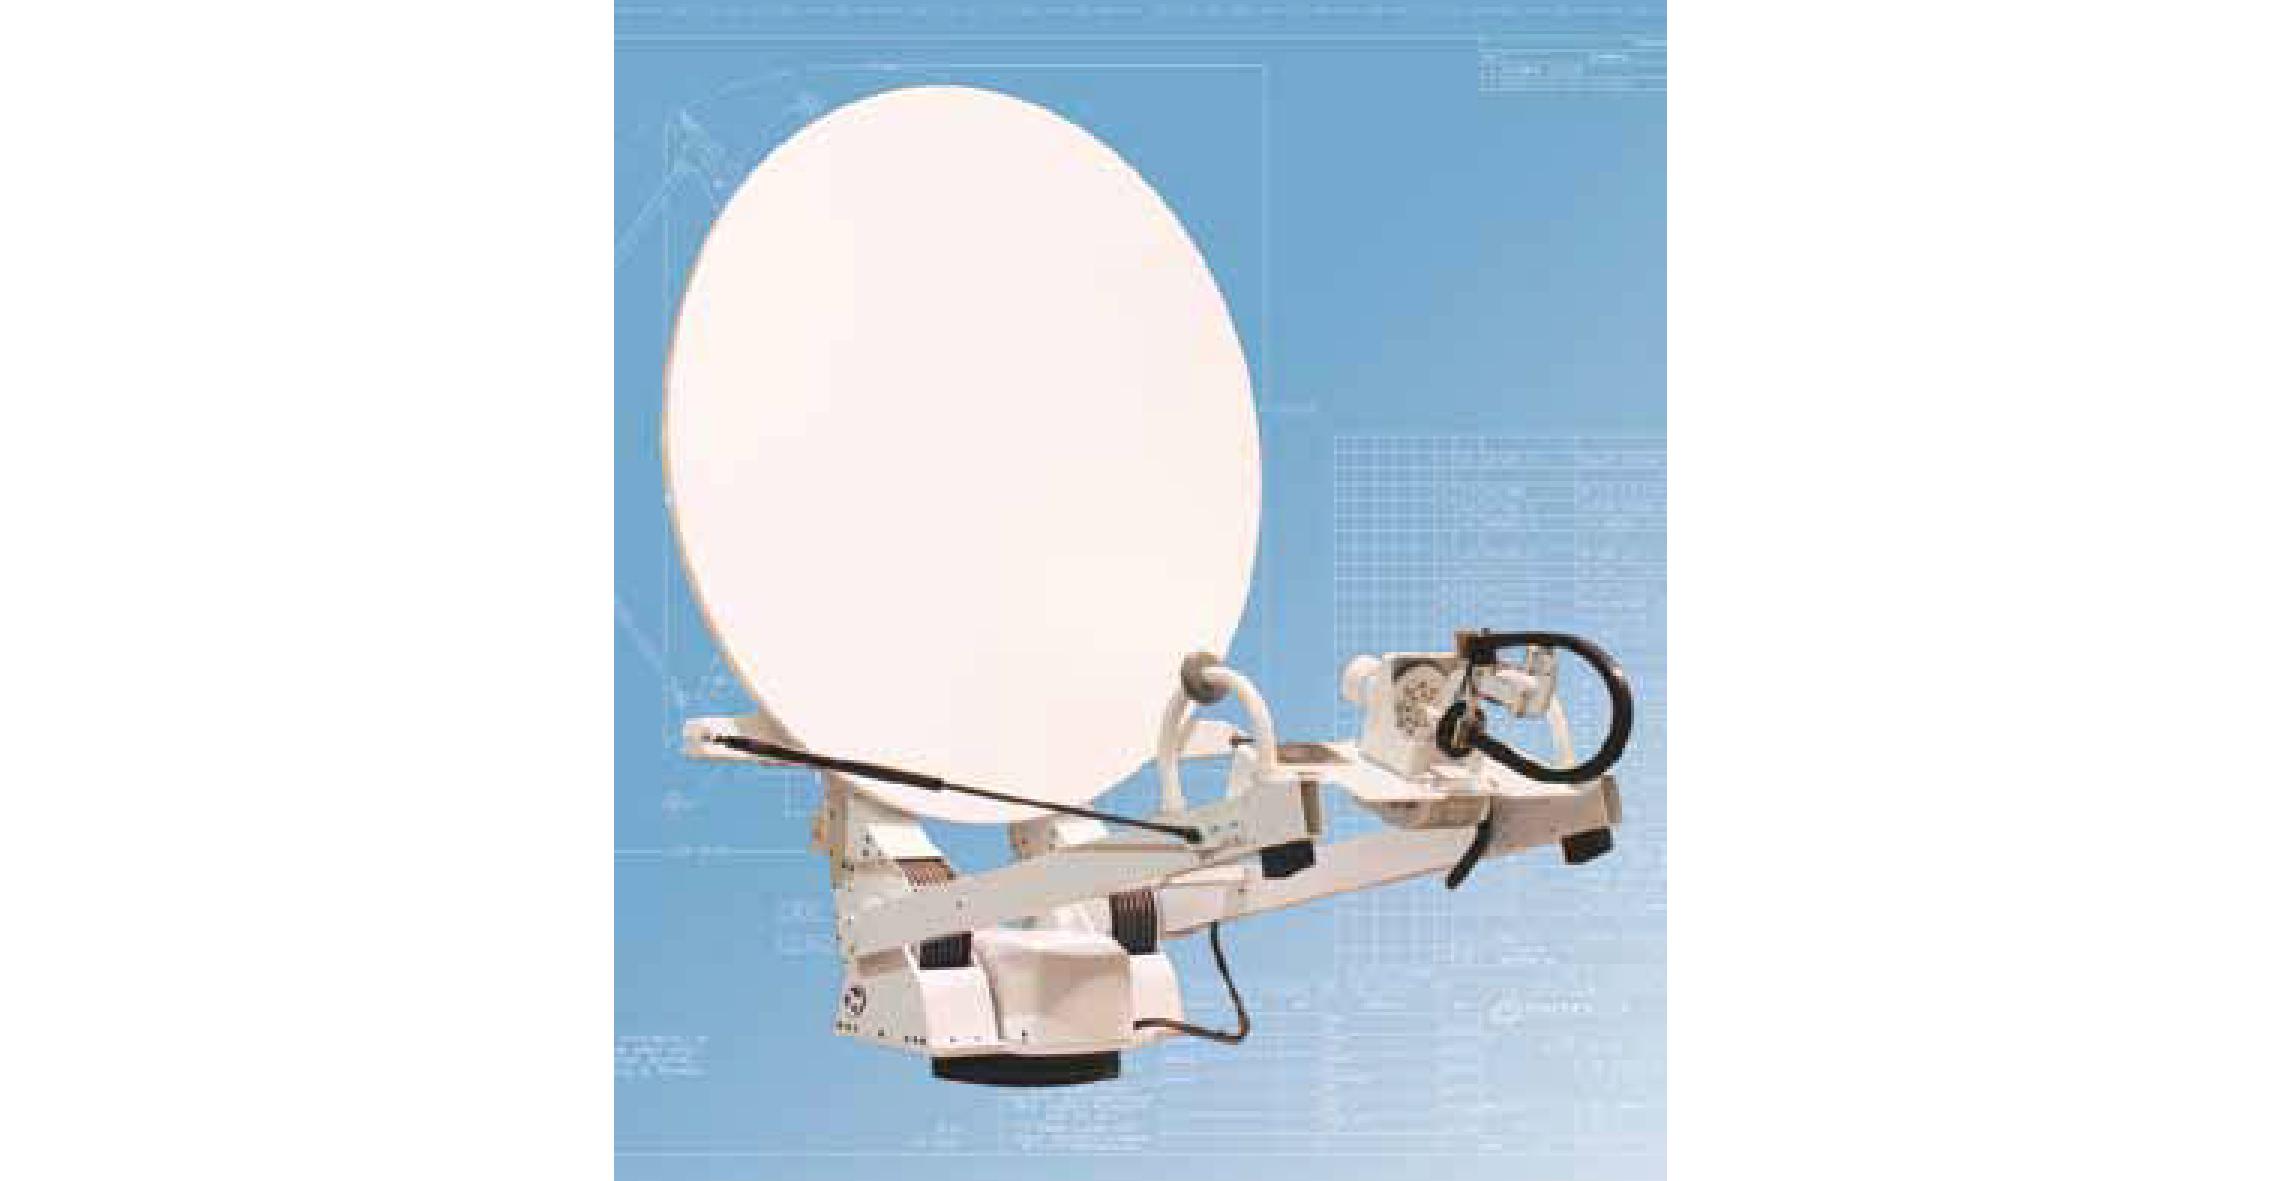 C125M 1.25m. Antenna